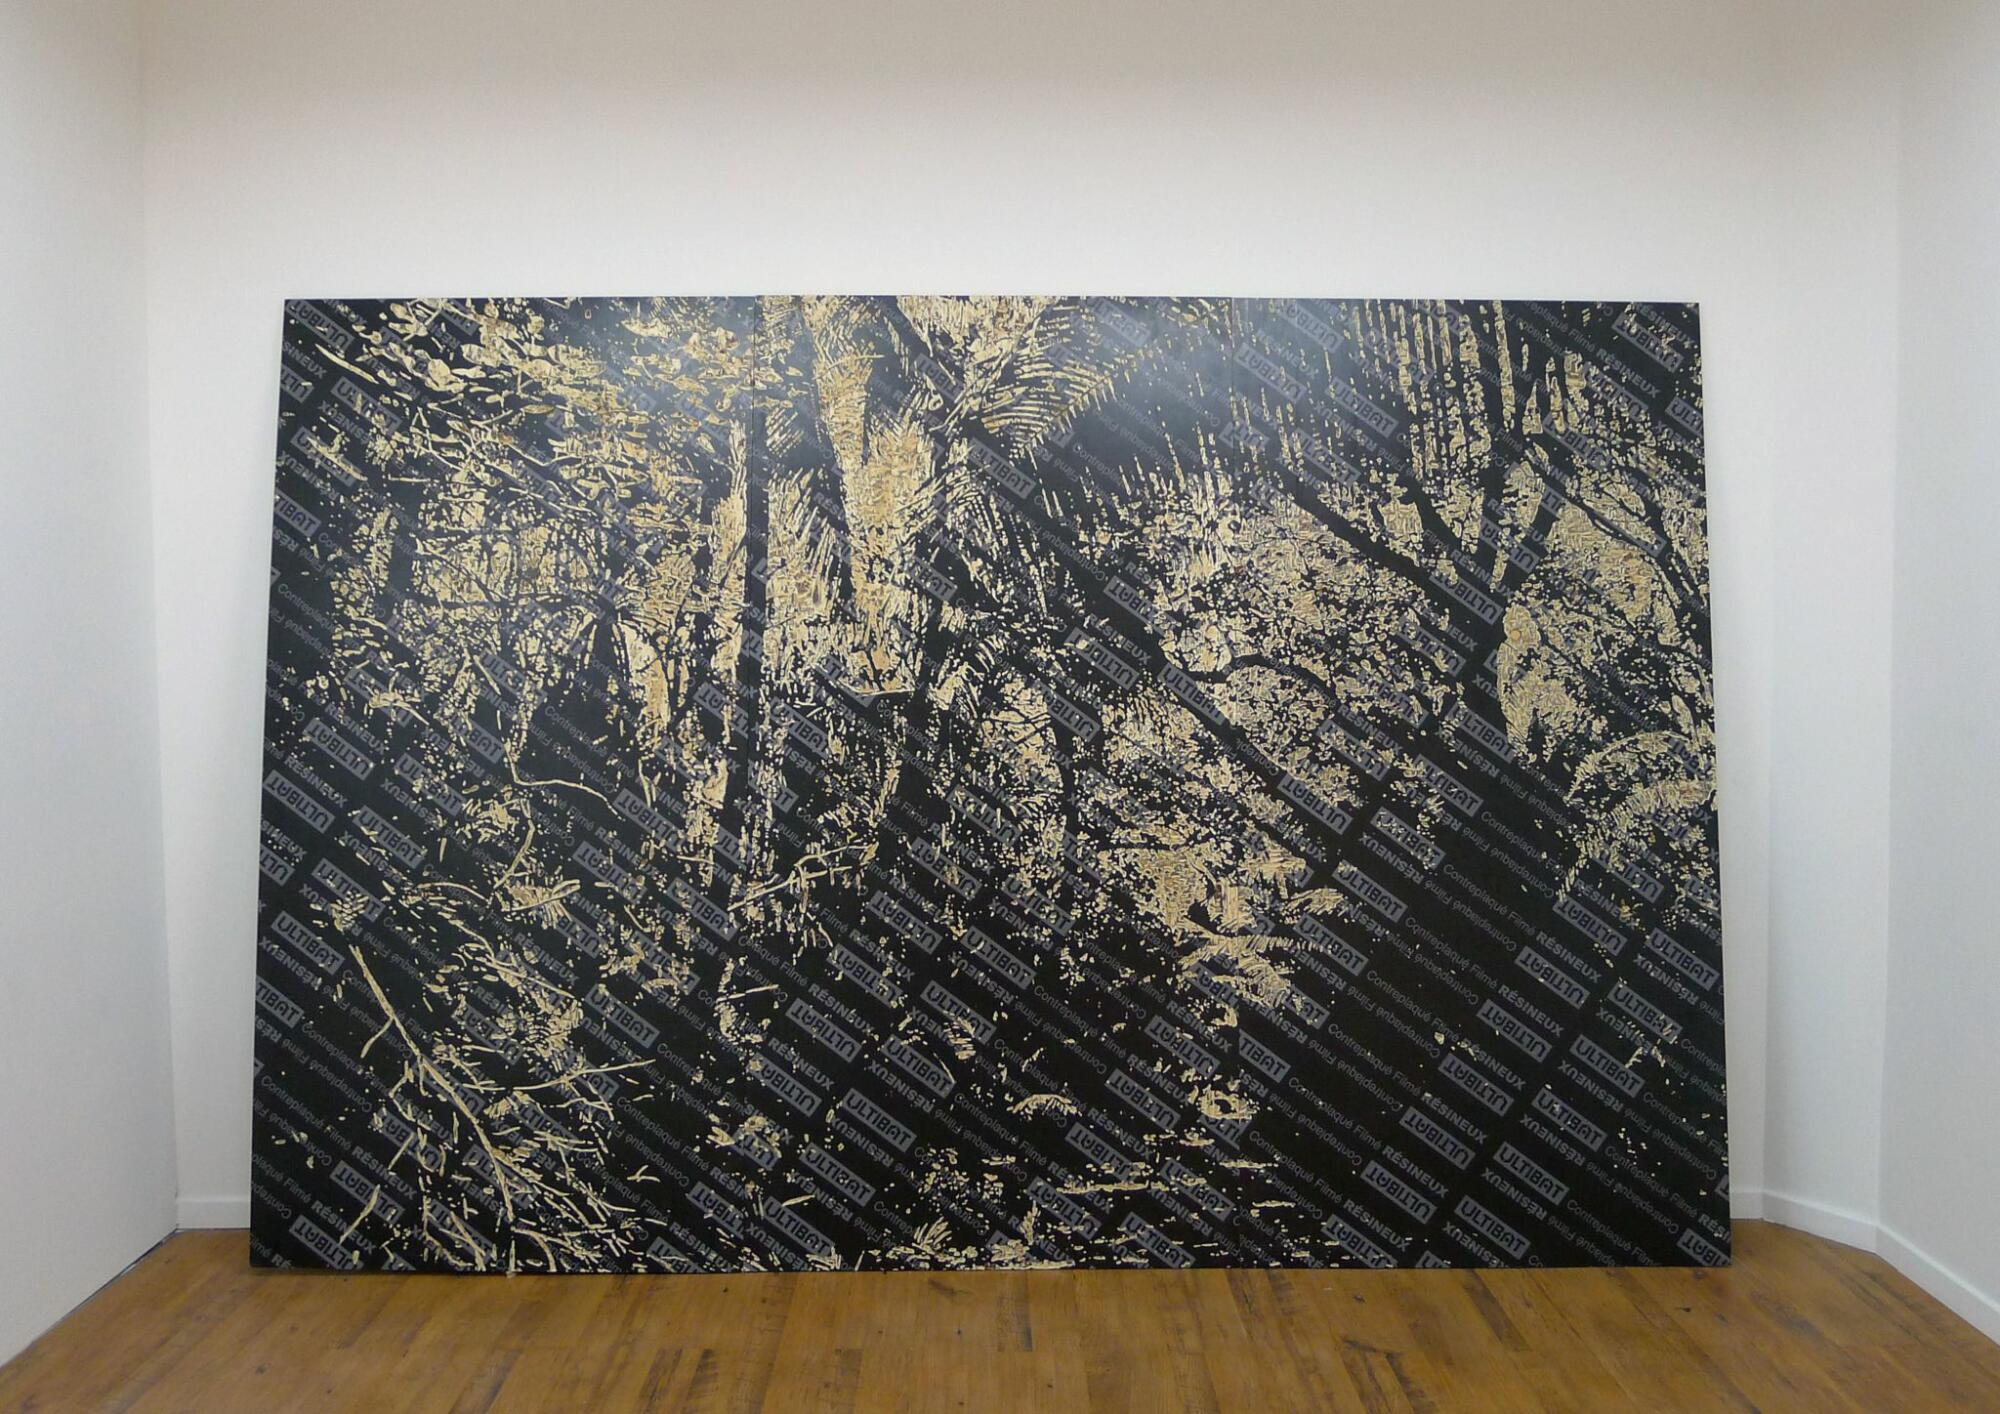 Jean Denant, Fondation, 2013 - Collection Frac Occitanie Montpellier. Photo Galerie Leonardo Agosti